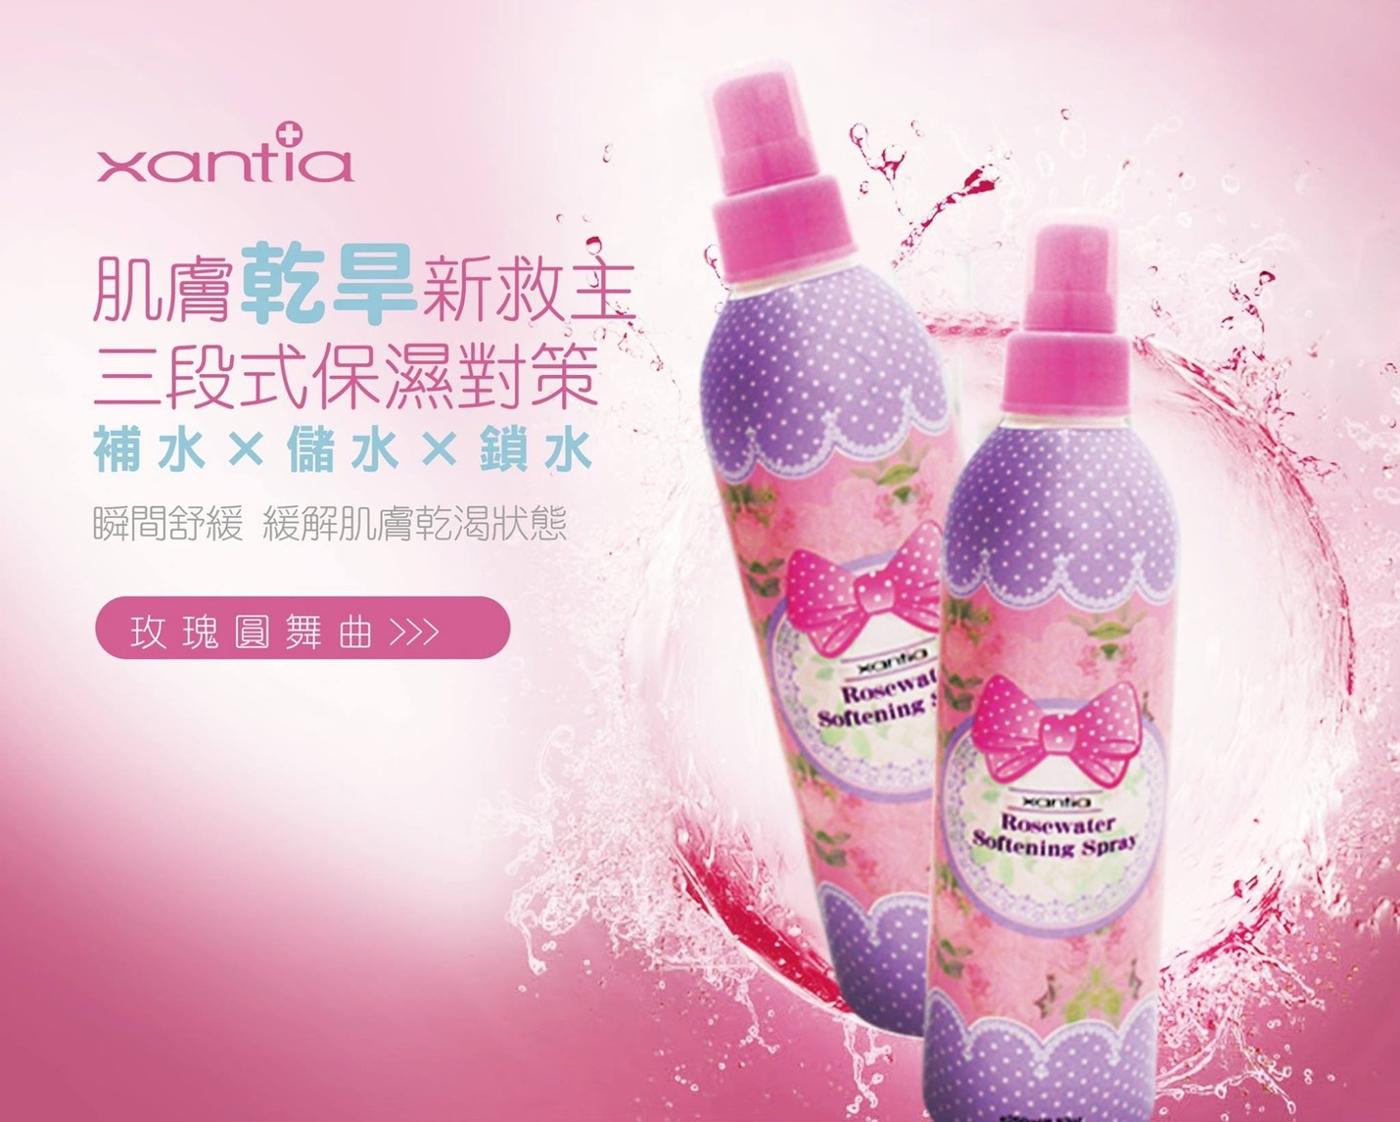 Xantia 玫瑰圓舞曲 補水噴霧 250ml【美日多多】